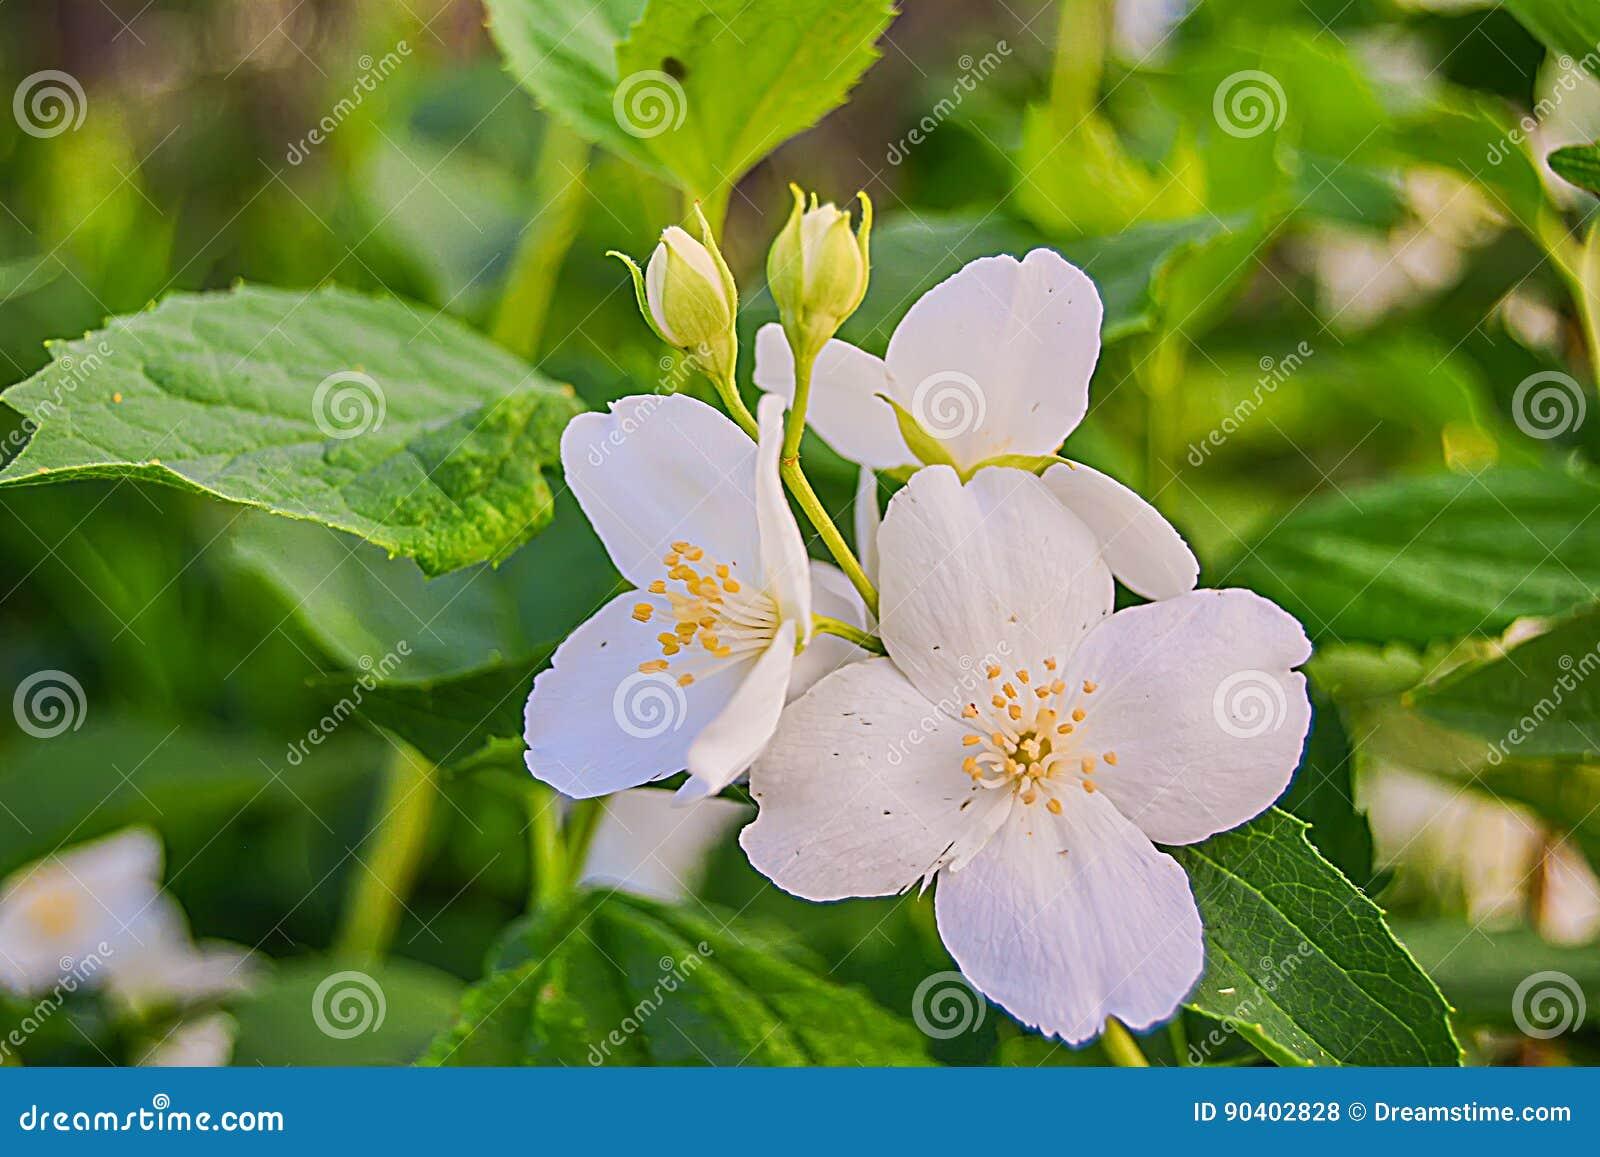 Jasmine Flower With Leaves Stock Photo Image Of Background 90402828